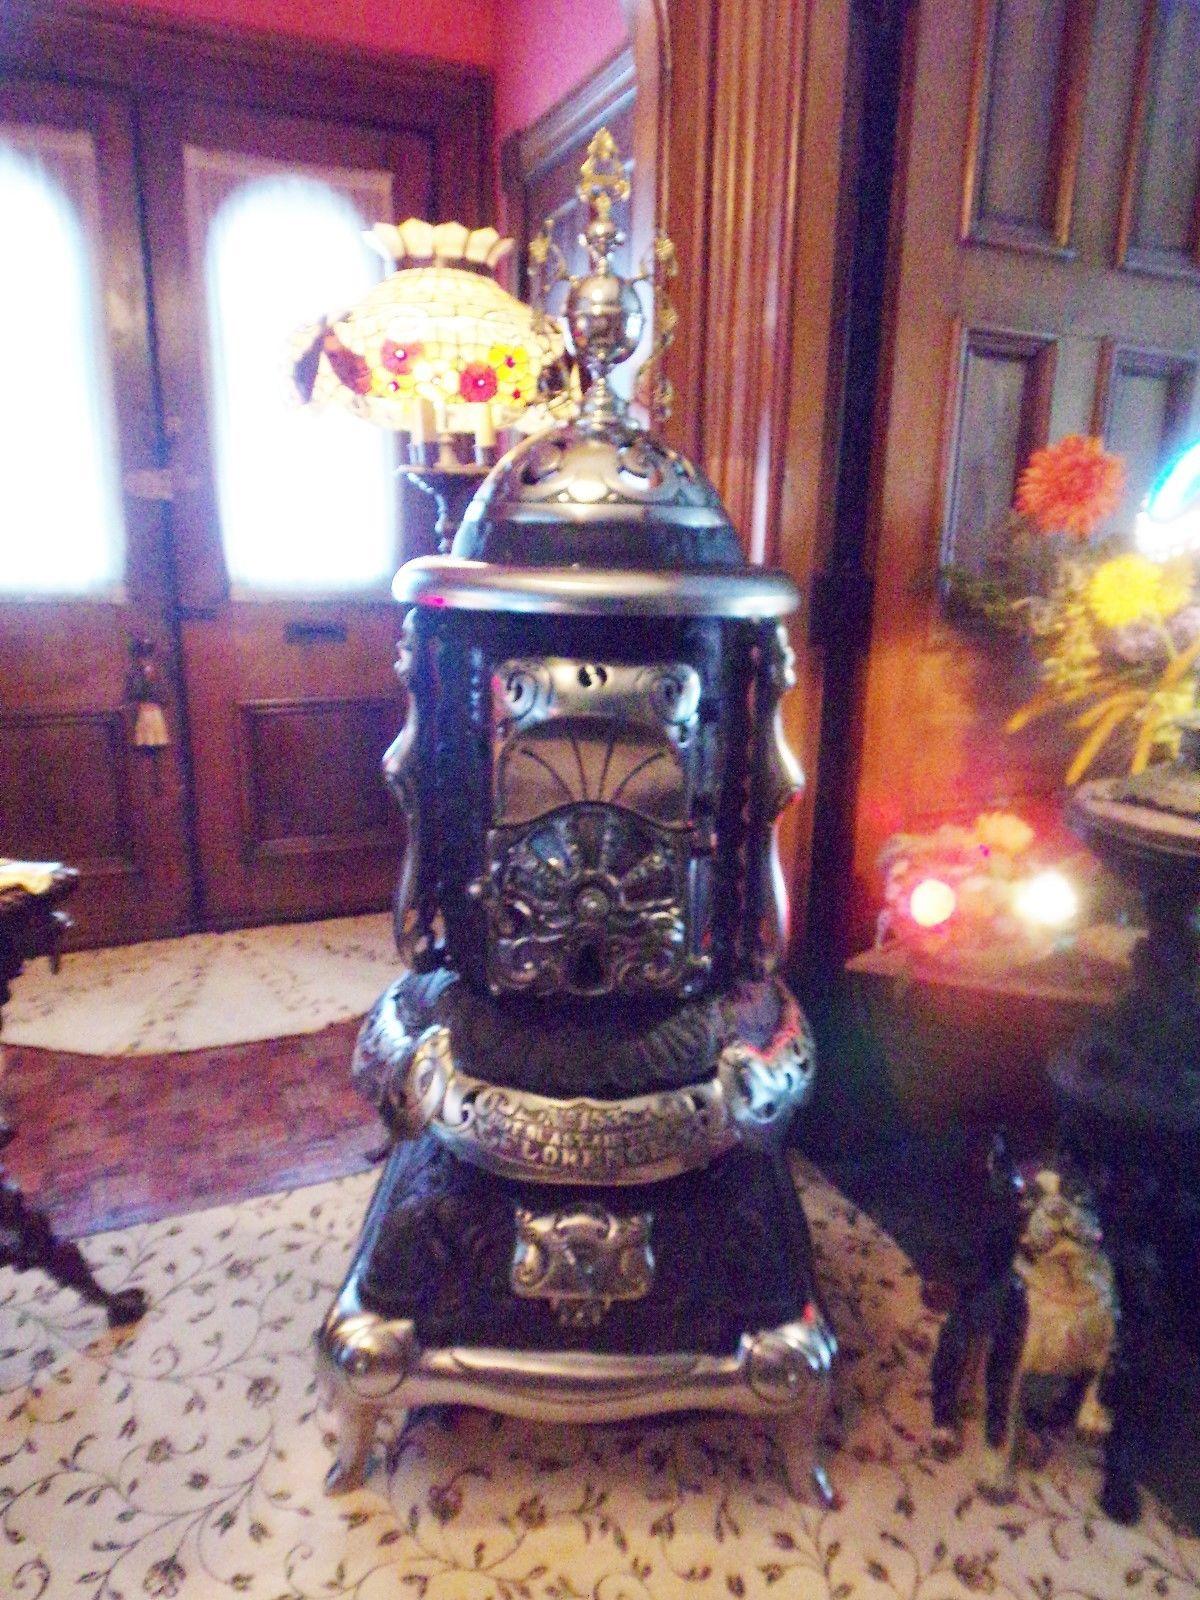 Antq 1899 Wood Burn Quot Florence Hot Blast Quot No 153 Parlor